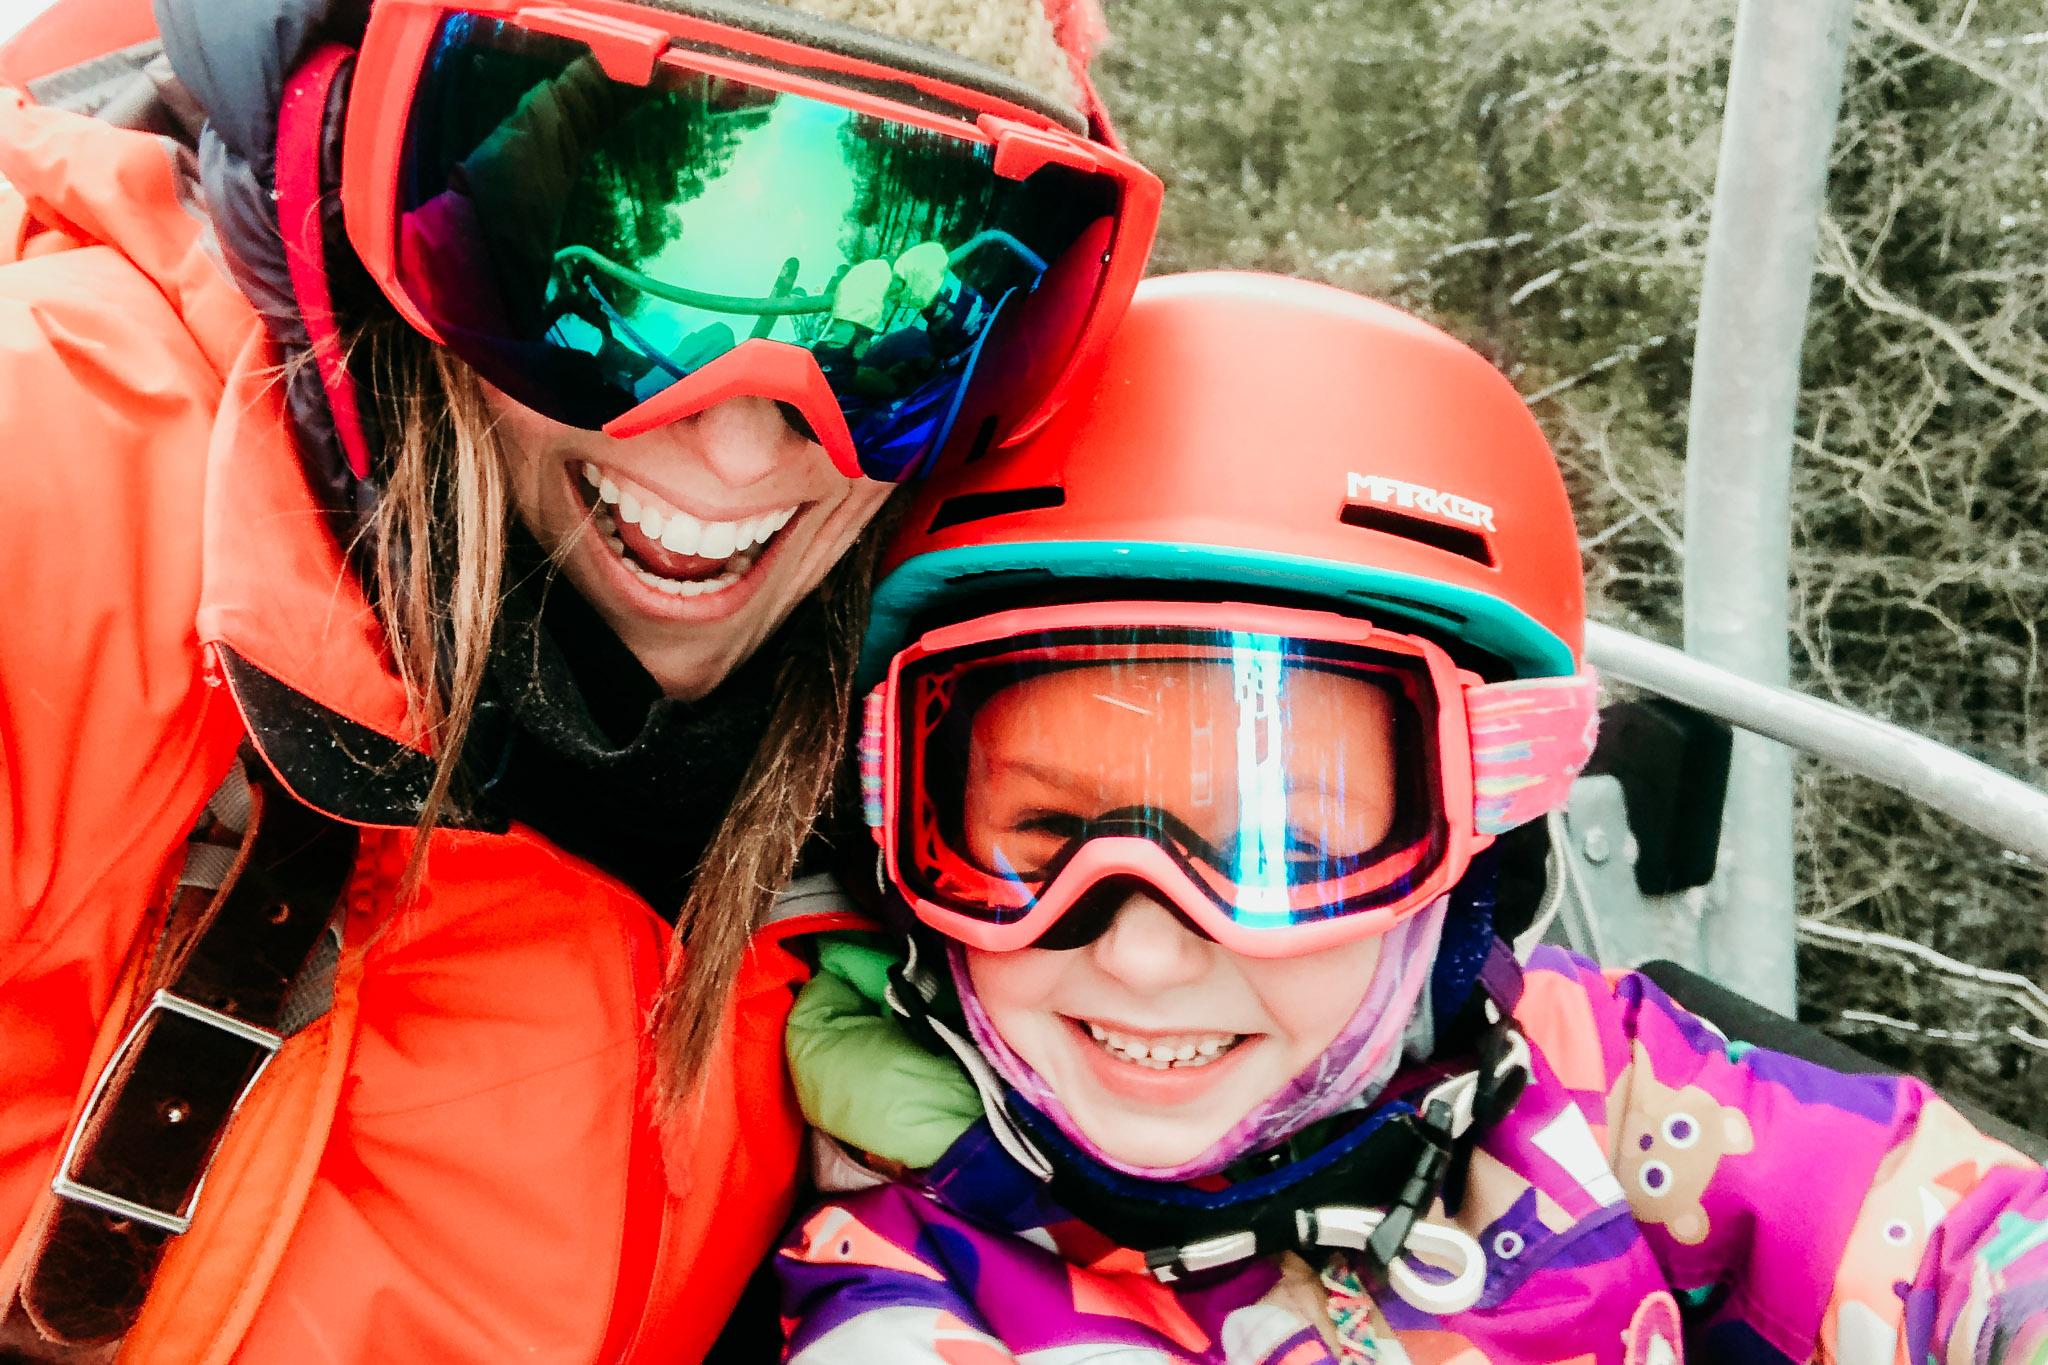 Chelsea Czibere - January 19, 2018 - Nakiska Ski Resort-15.jpg